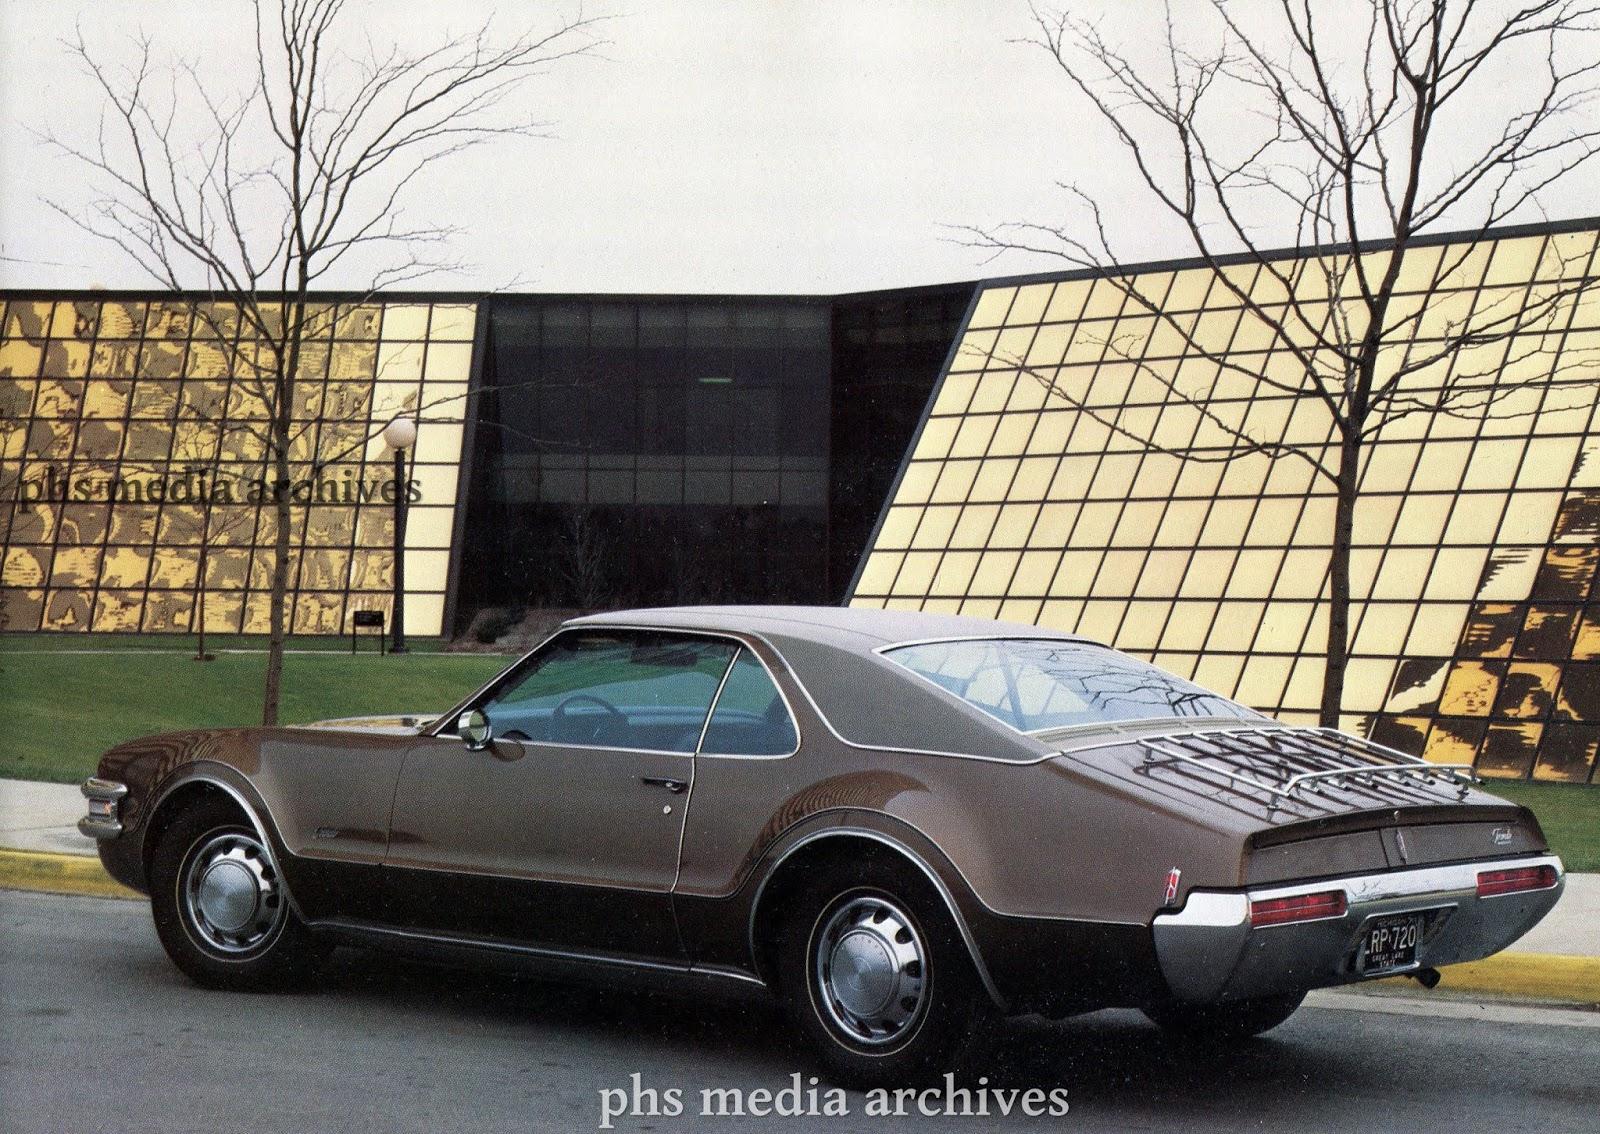 1969 OLDSMOBILE CUTLASS 442 98 88 TORONADO NEW CAR WARRANTY GLOVE BOX BOOKLET